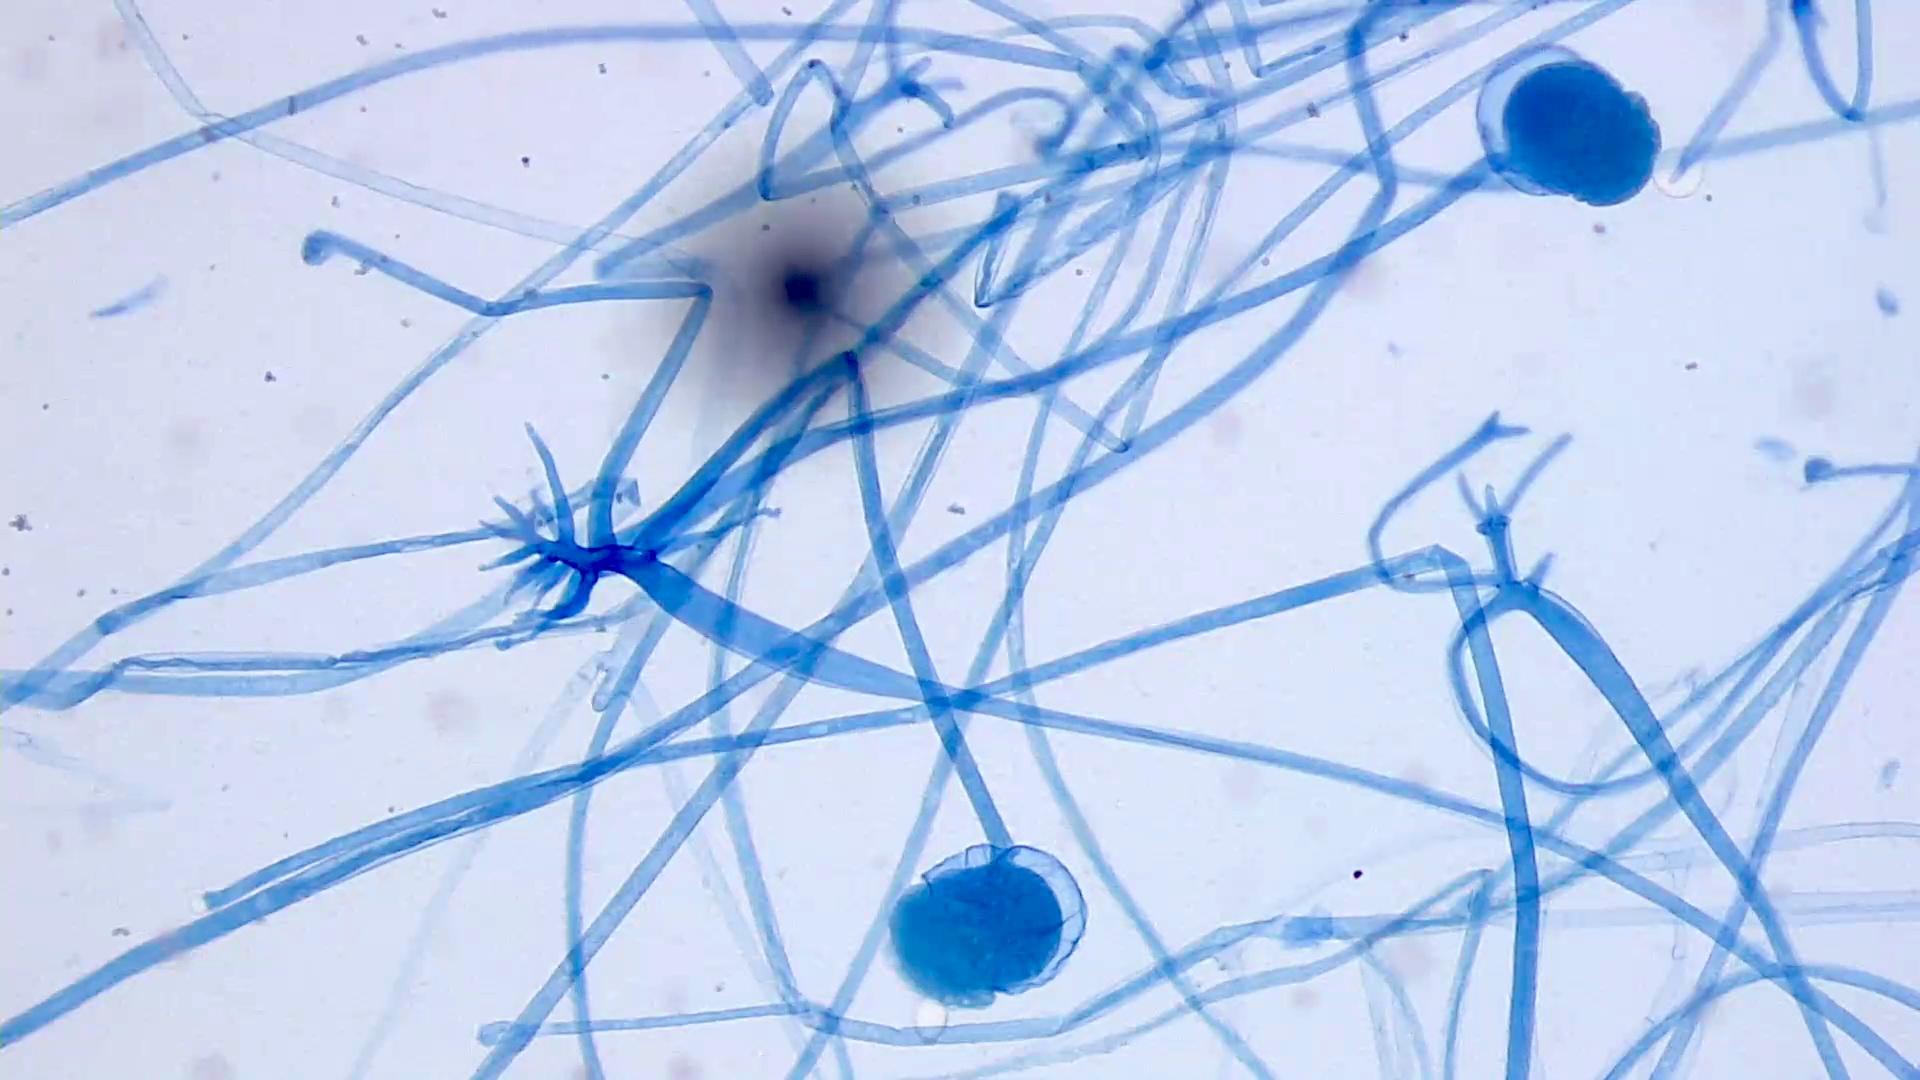 Mucor species fungal elements